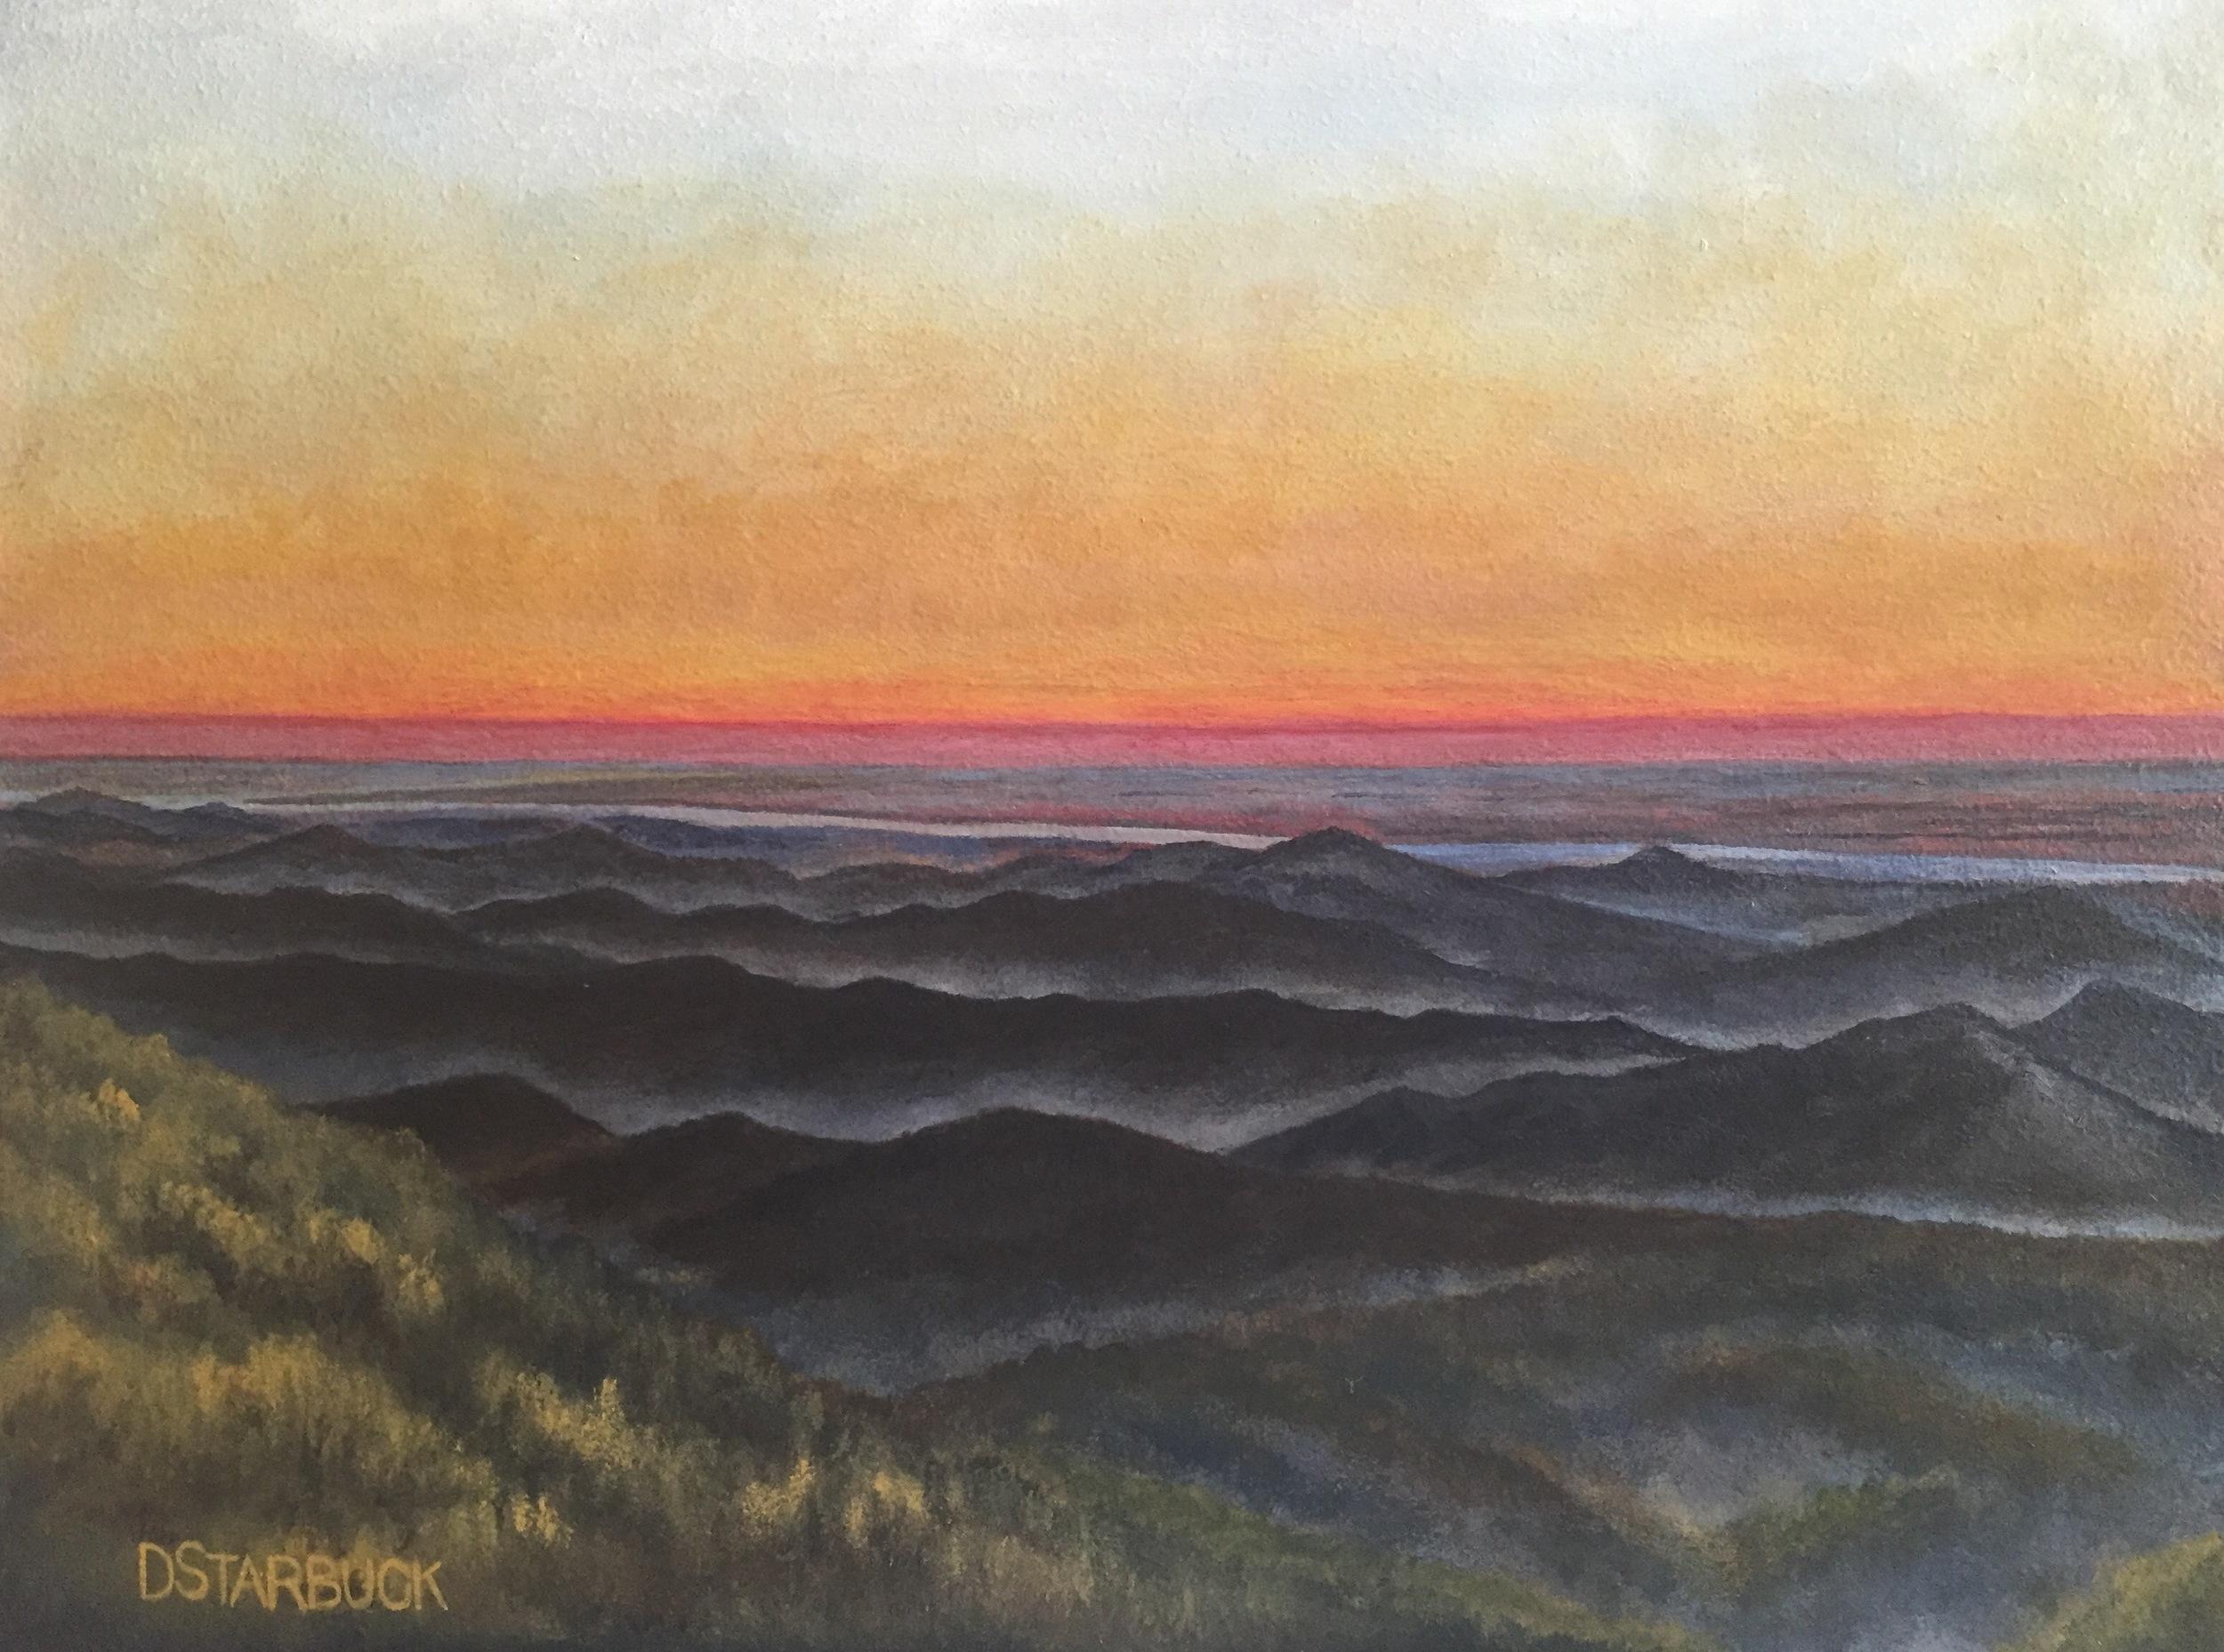 """Blue Ridge Day Break"" at Stack Creek Overlook, Blue Ridge Parkway, North Carolina  Original: Acrylic on Panel, 10"" x 13.5"""